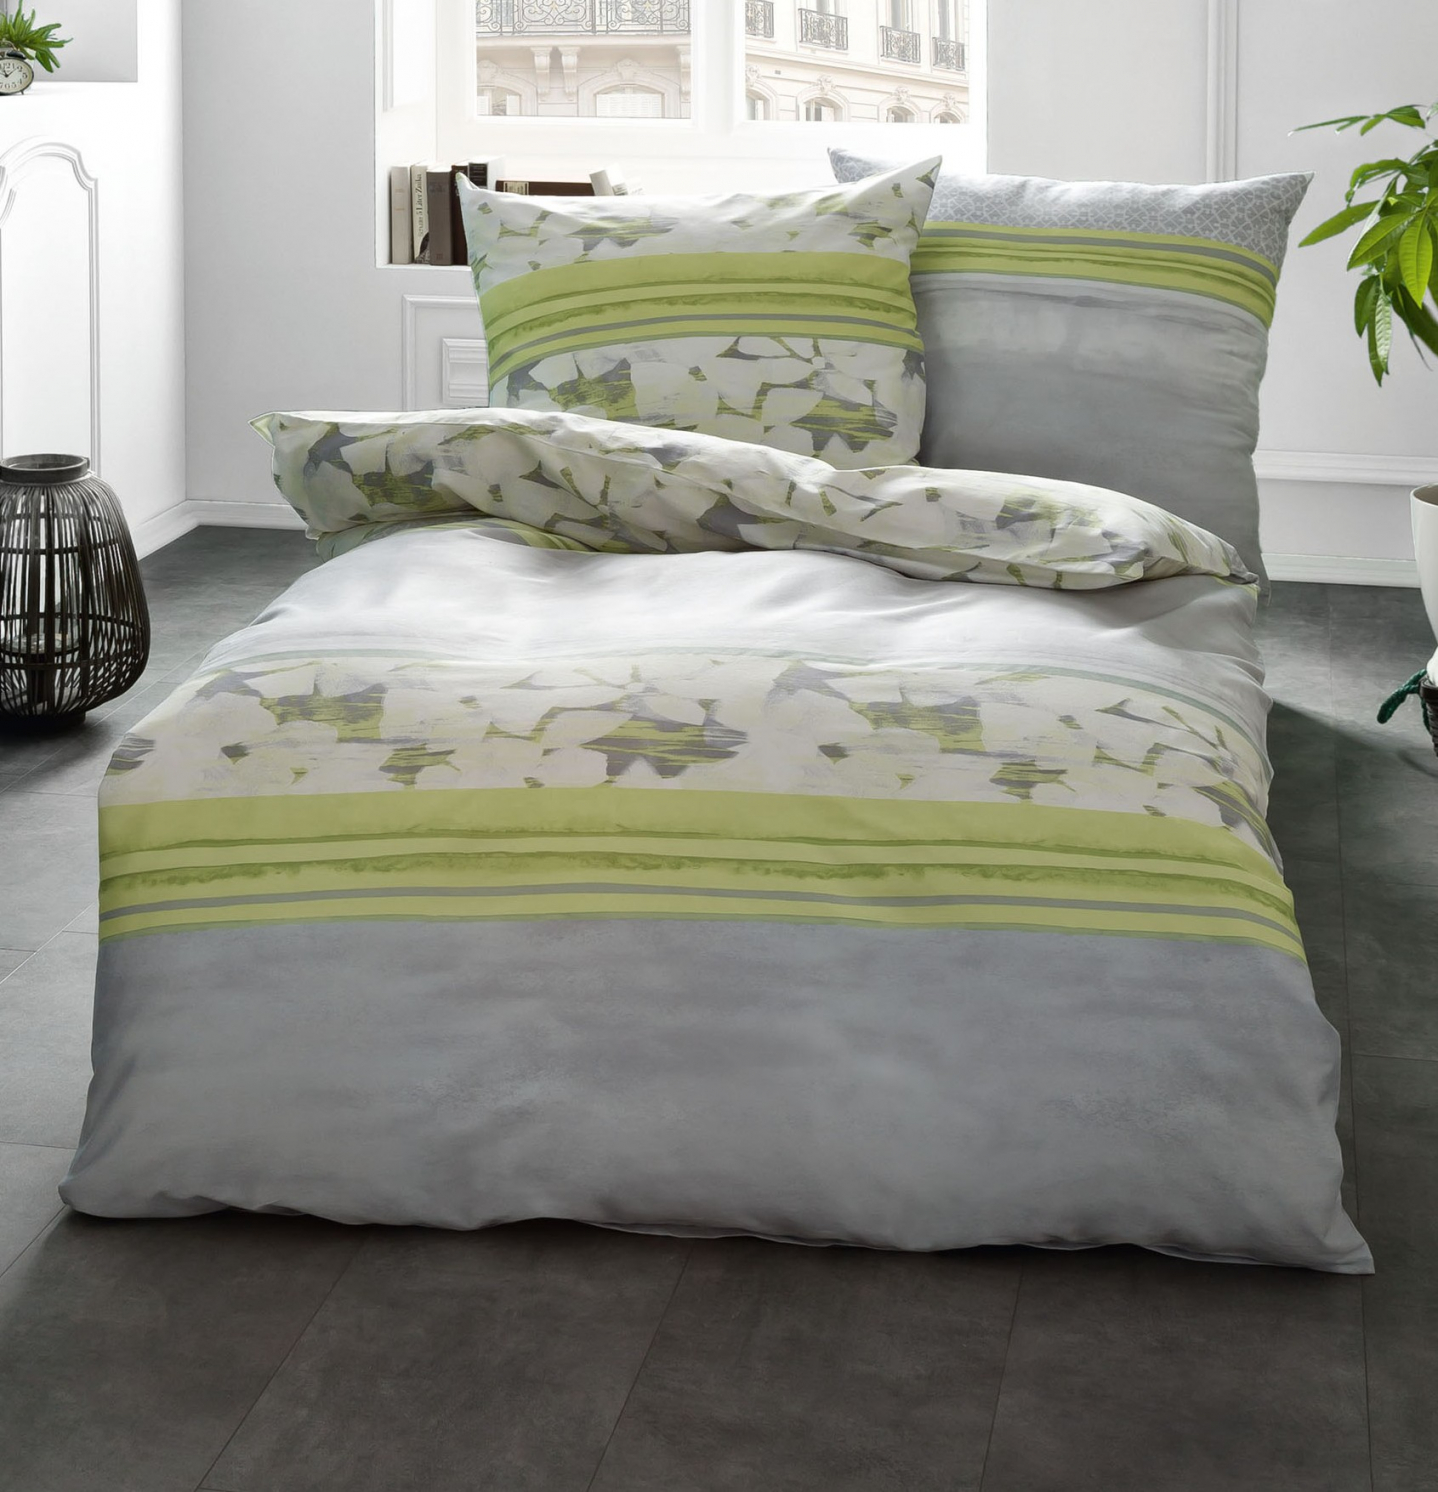 Vibrant Idea Bettwasche Bedrucken Lassen  Wwwkhoddam von Bettwäsche Bedrucken Lassen Preisvergleich Photo